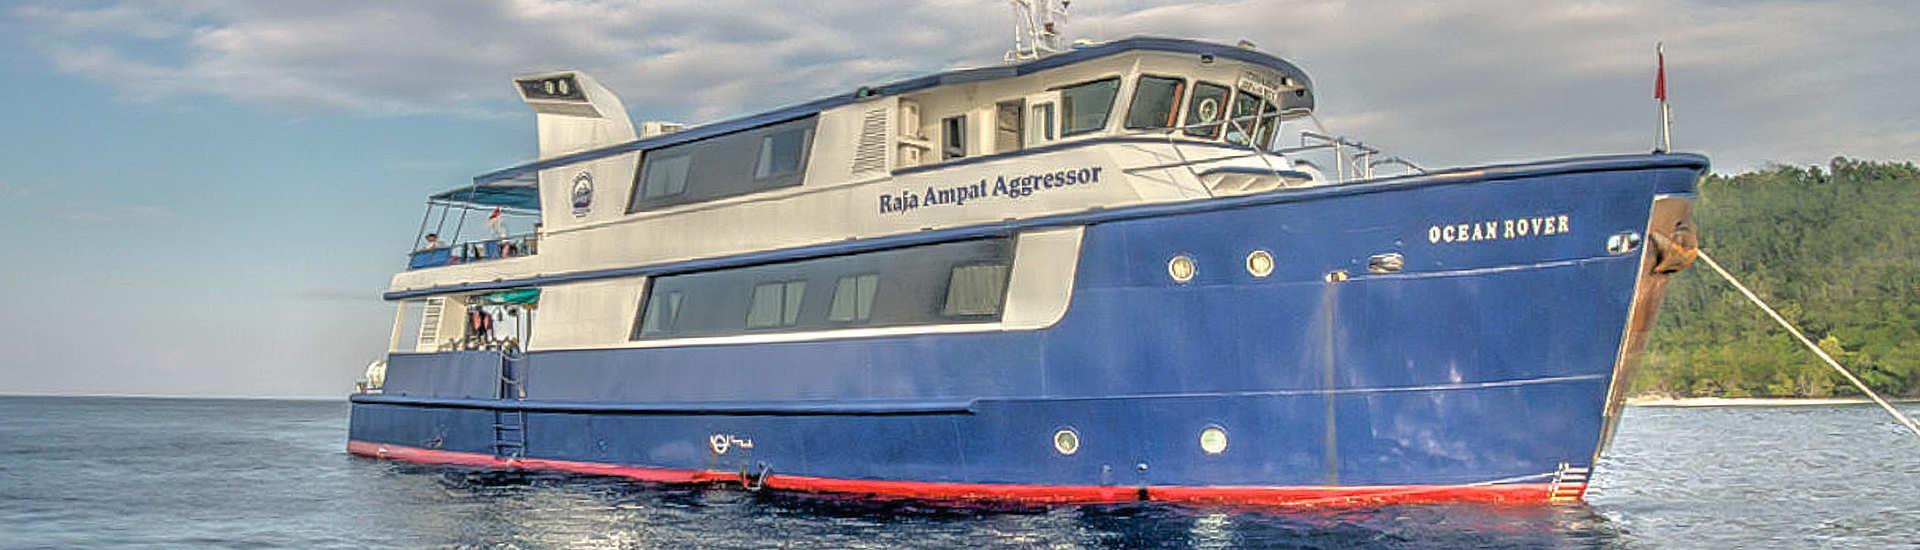 früher Ocean Rover – heute Raja Ampat Aggressor